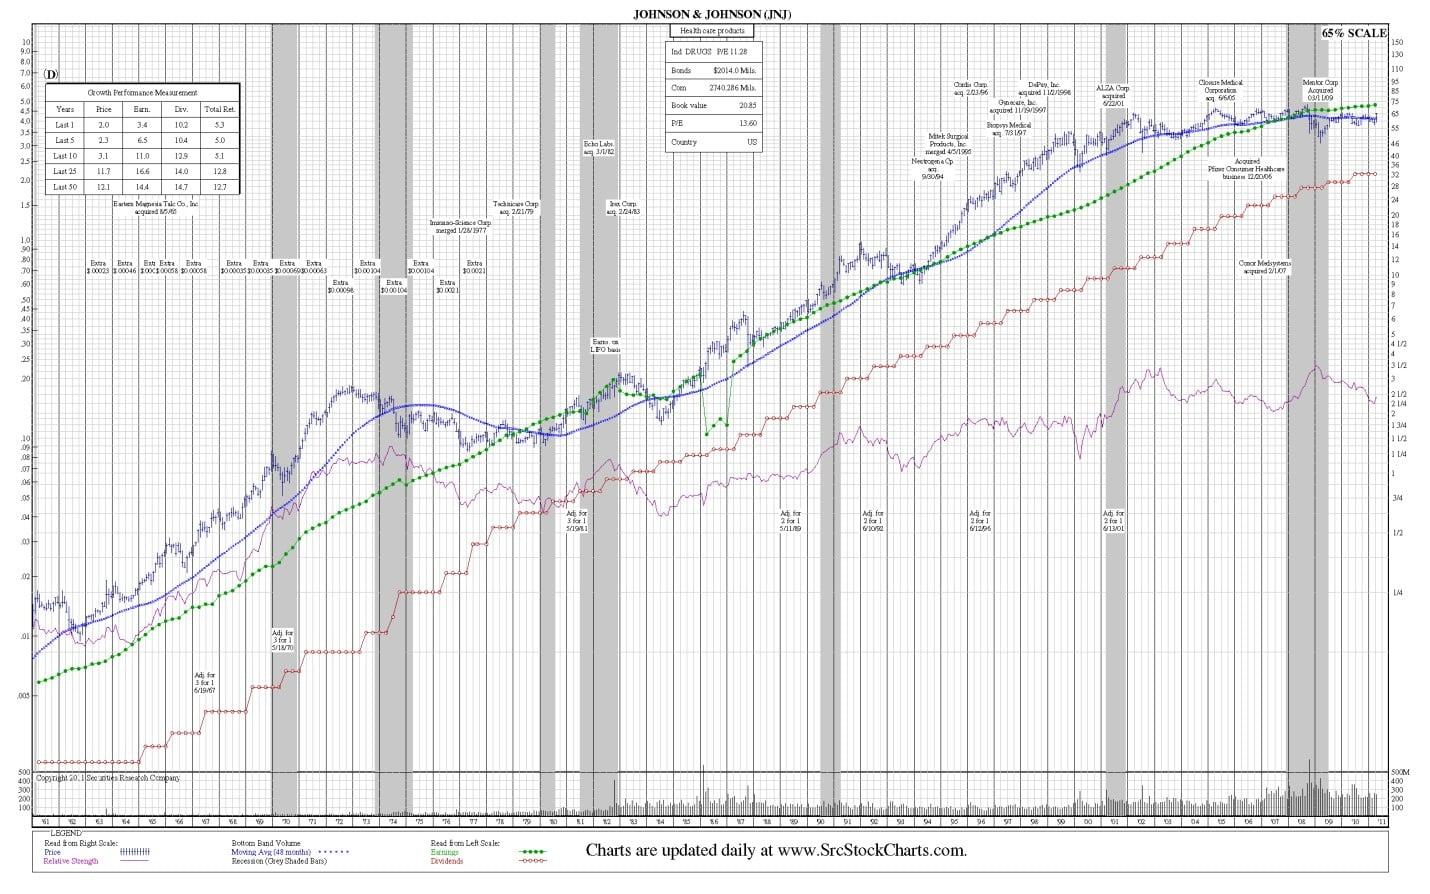 jnj-50-year-chart